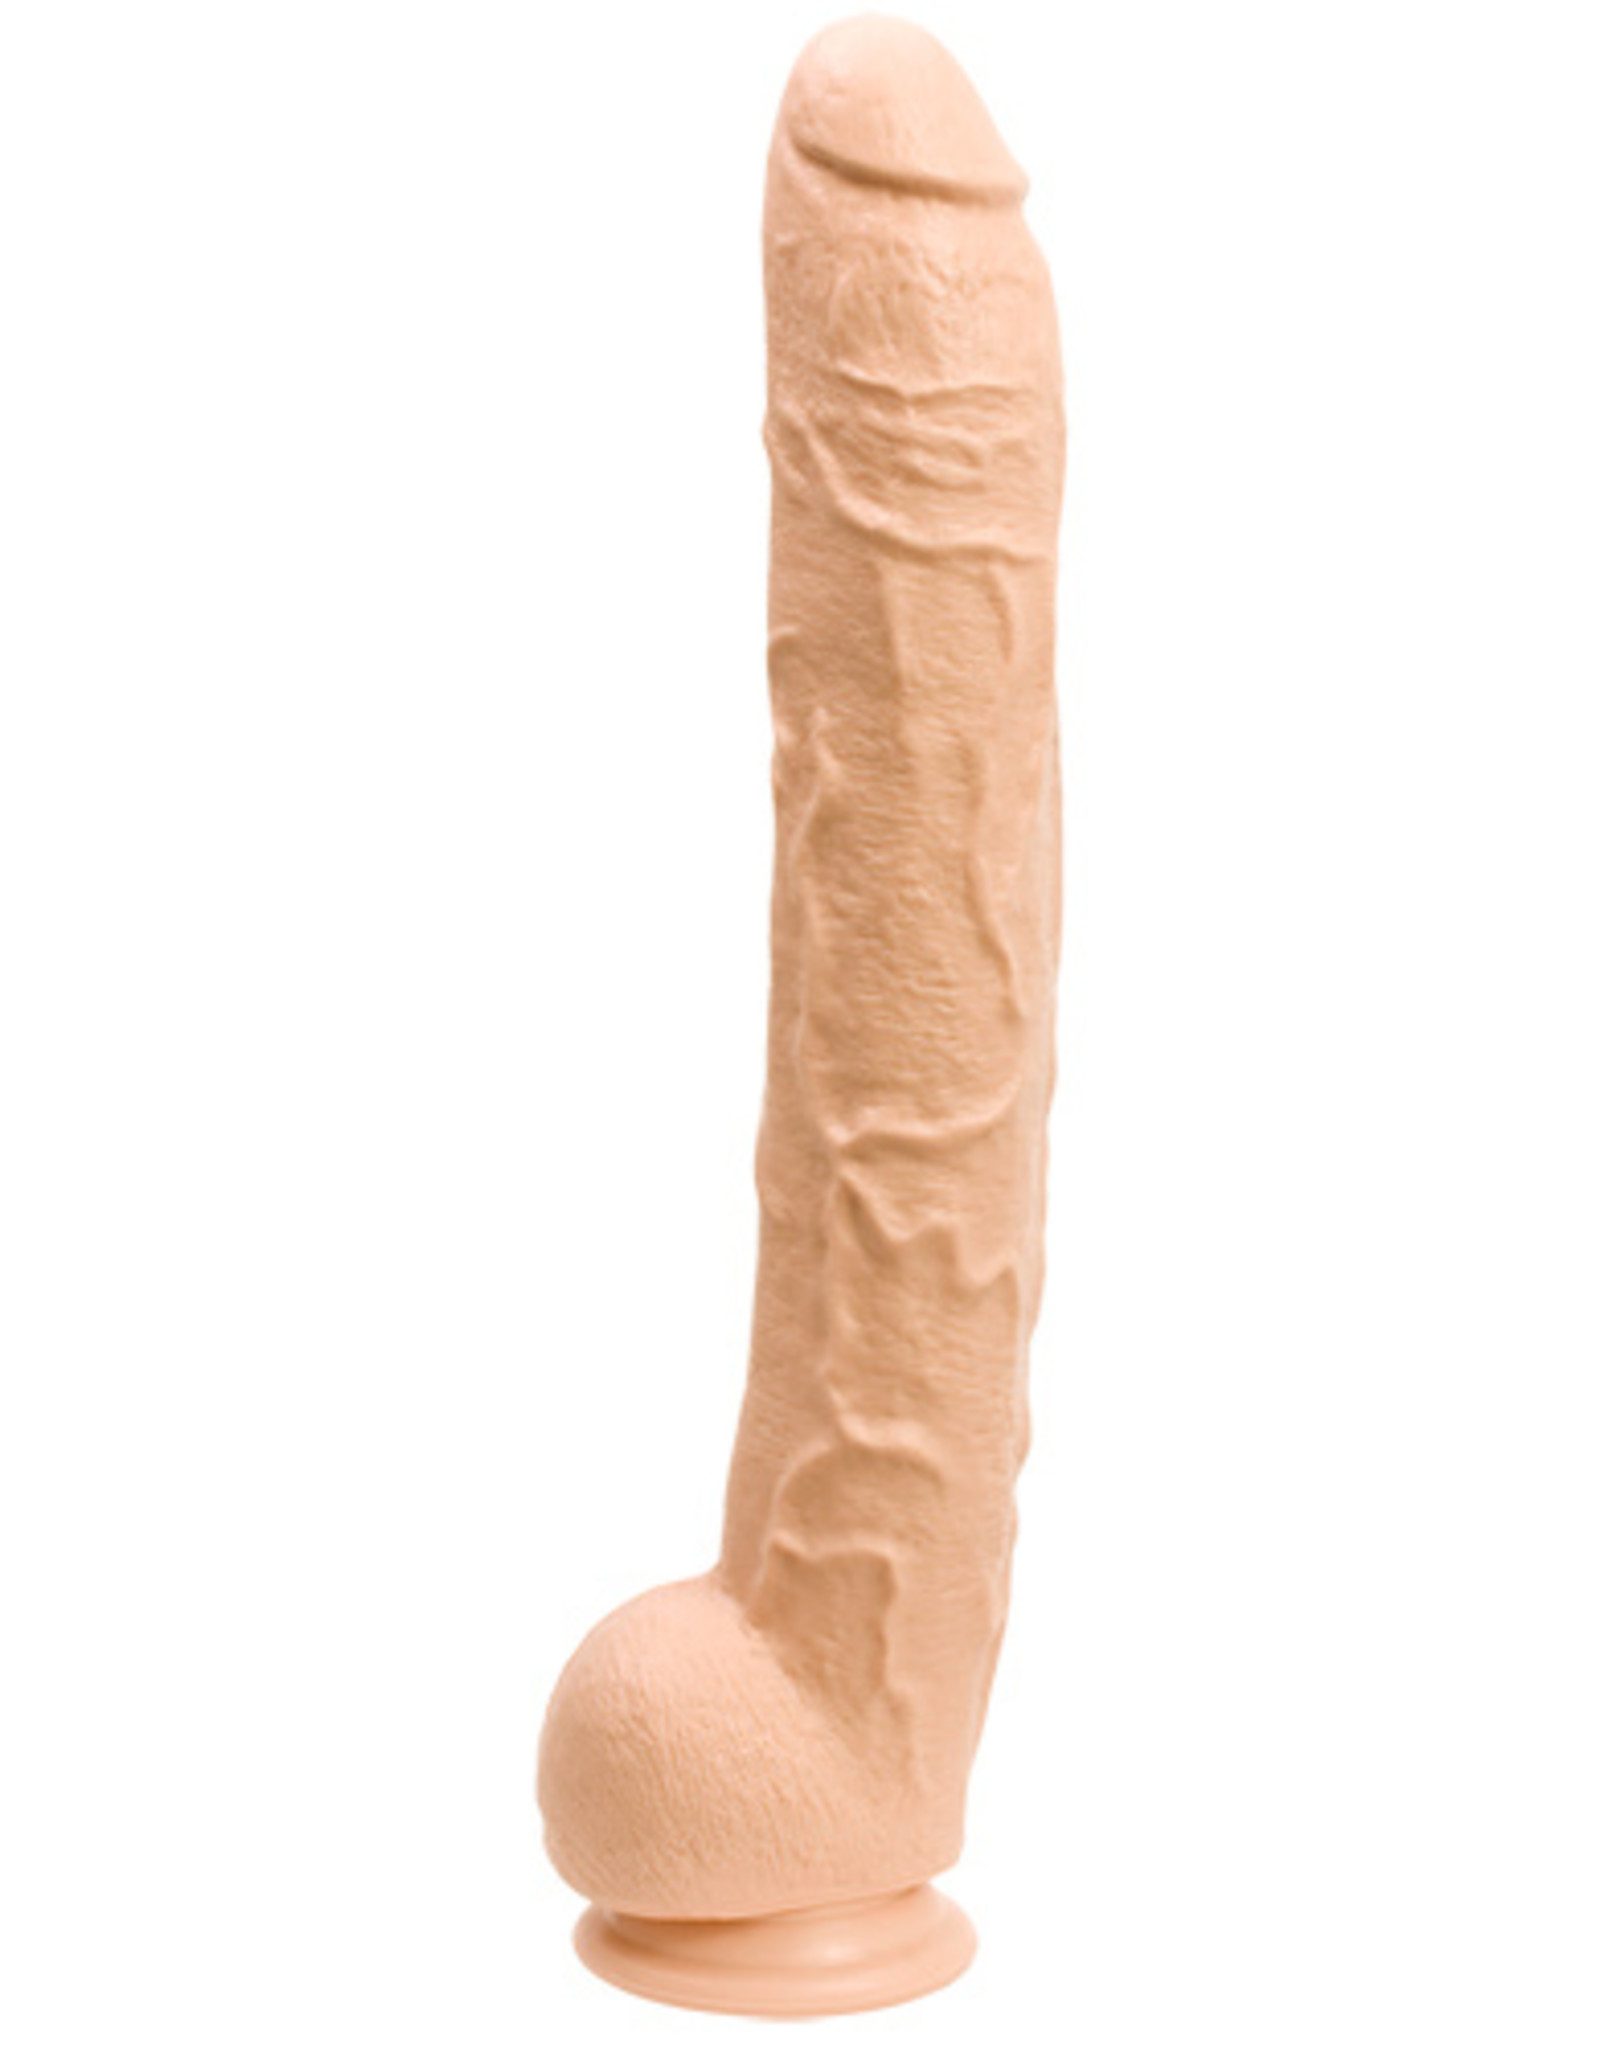 The Classics Dick Rambone Realistische XL Dildo Met Balzak - 33 cm